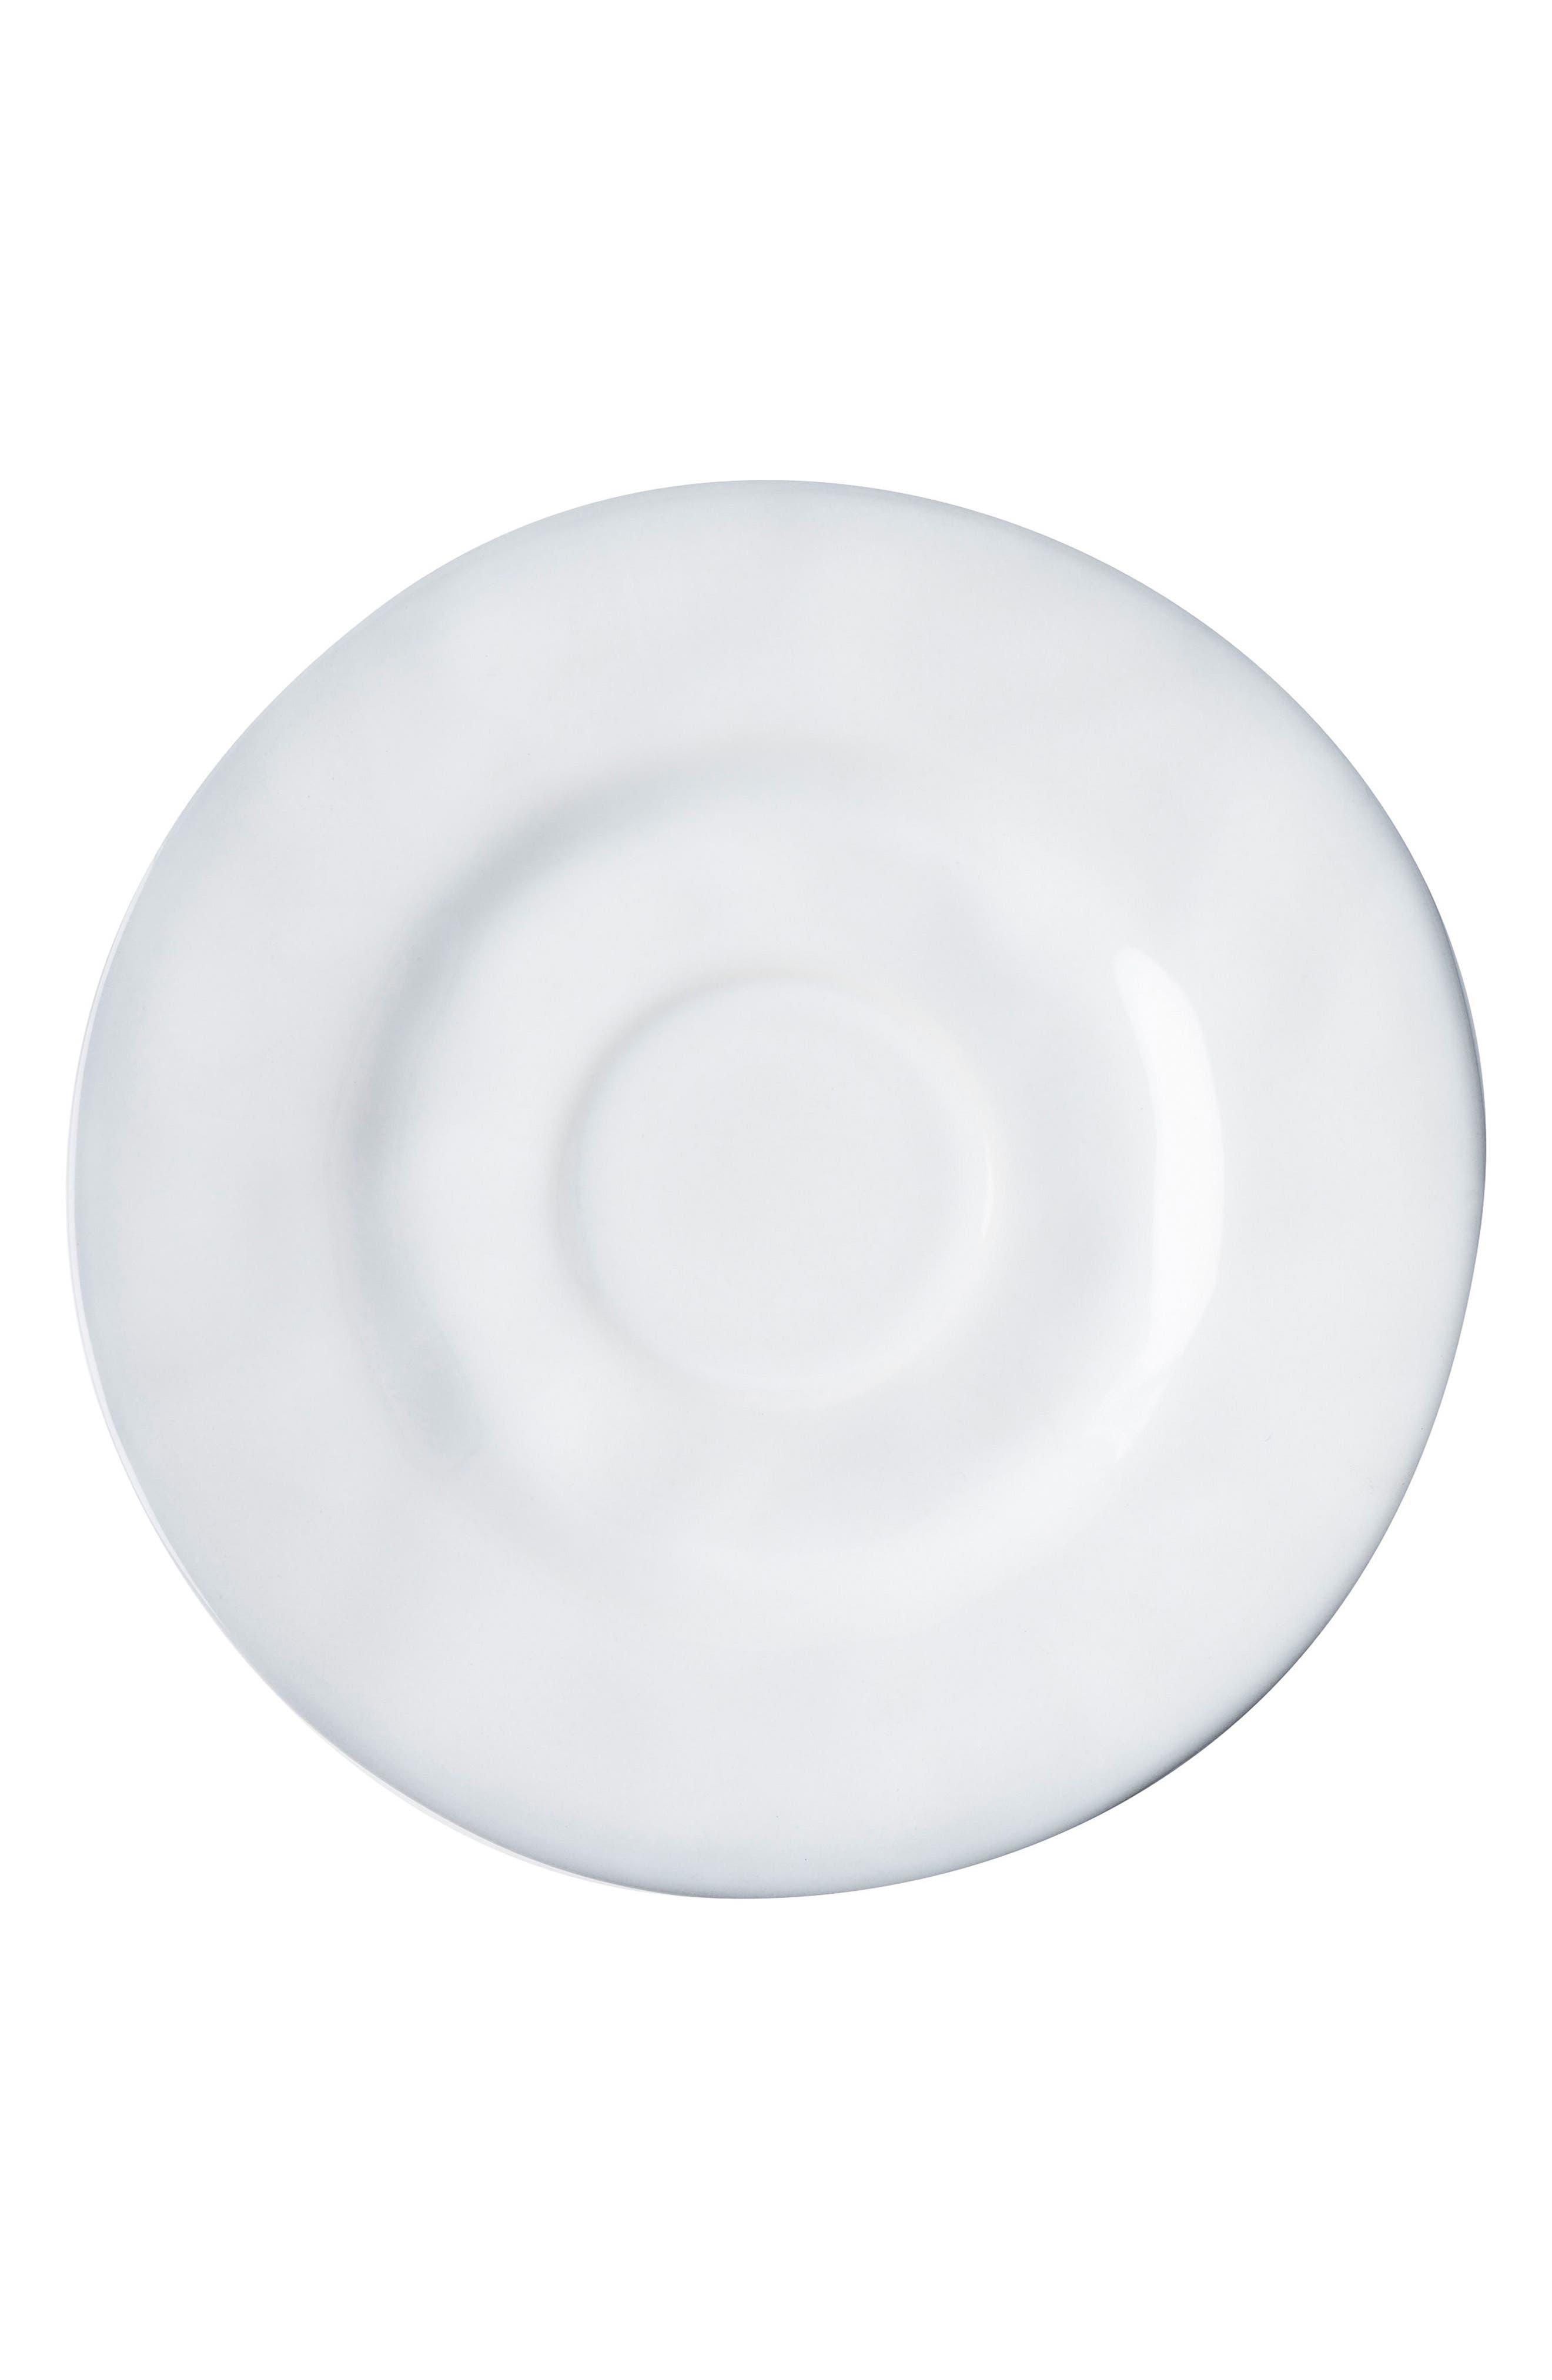 Quotidien White Truffle Ceramic Saucer,                             Main thumbnail 1, color,                             WHITE TRUFFLE